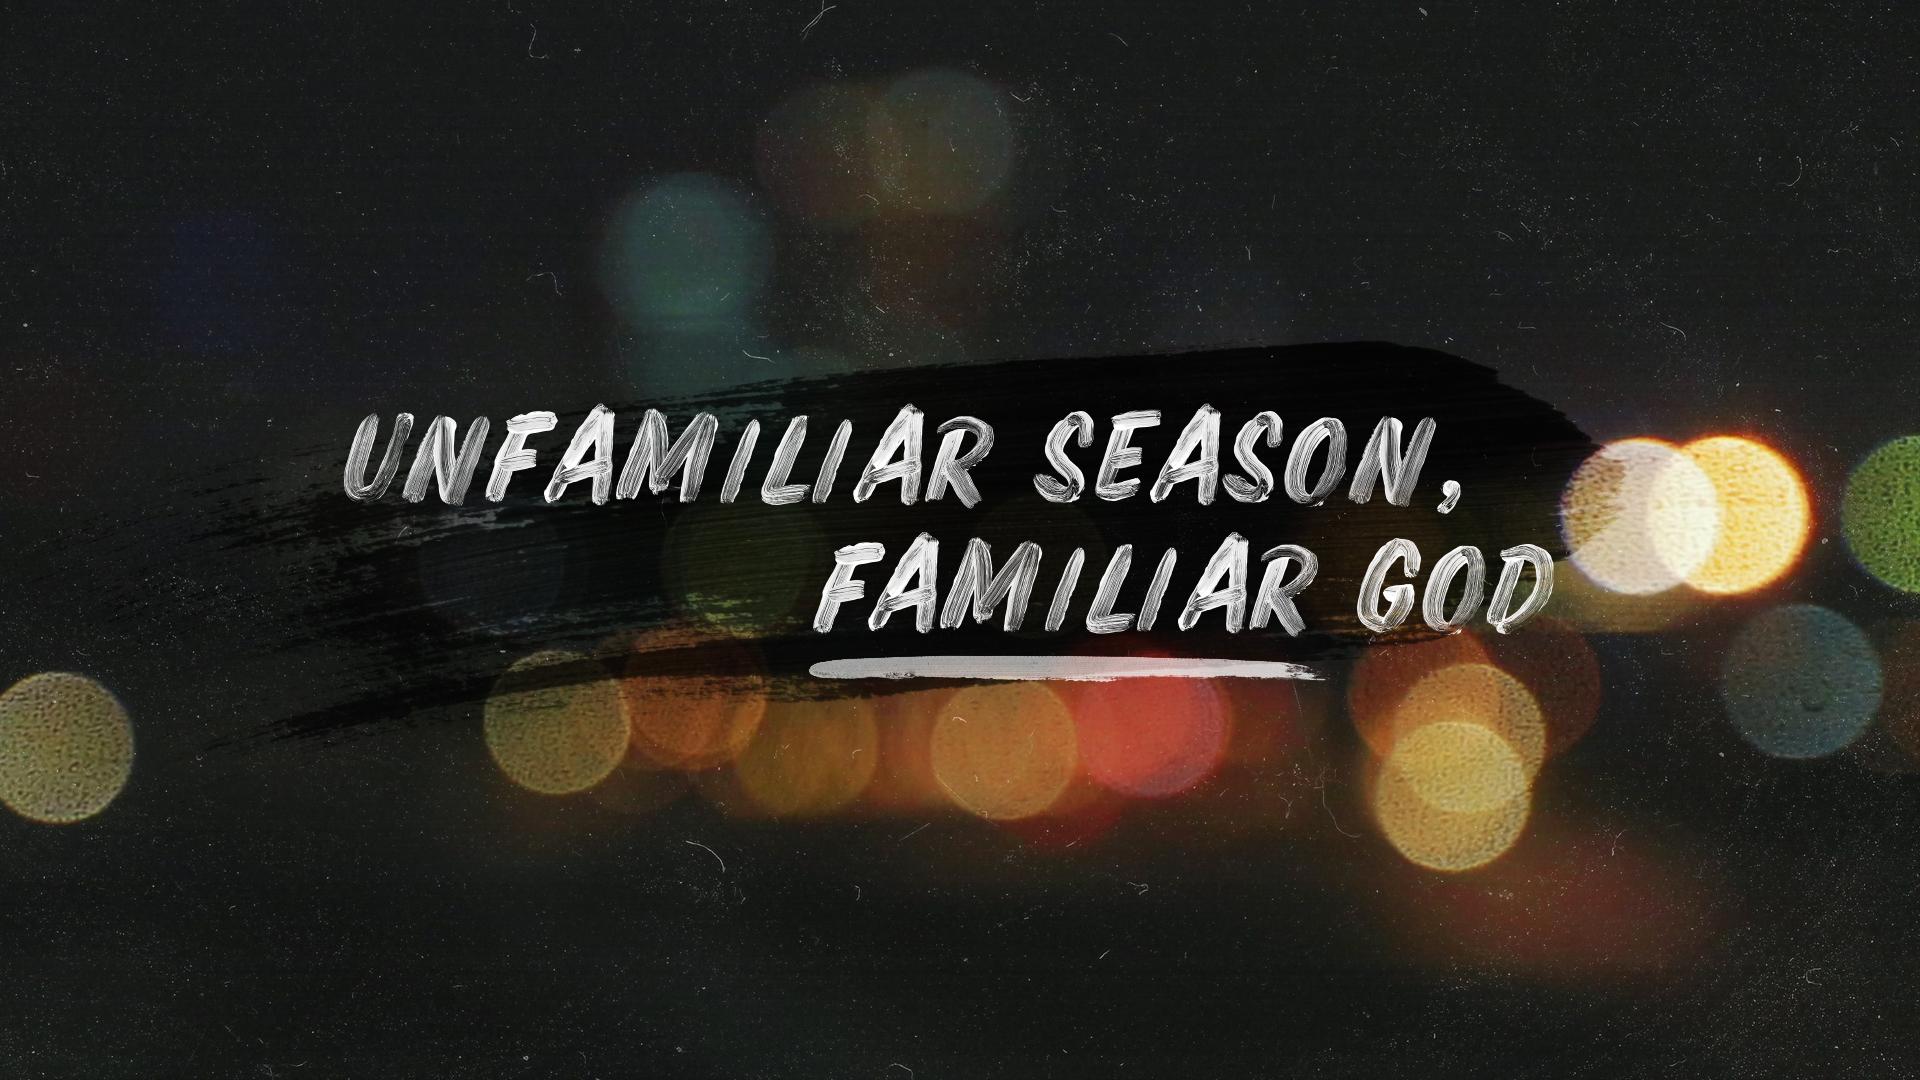 Unfamiliar Season, Familiar God